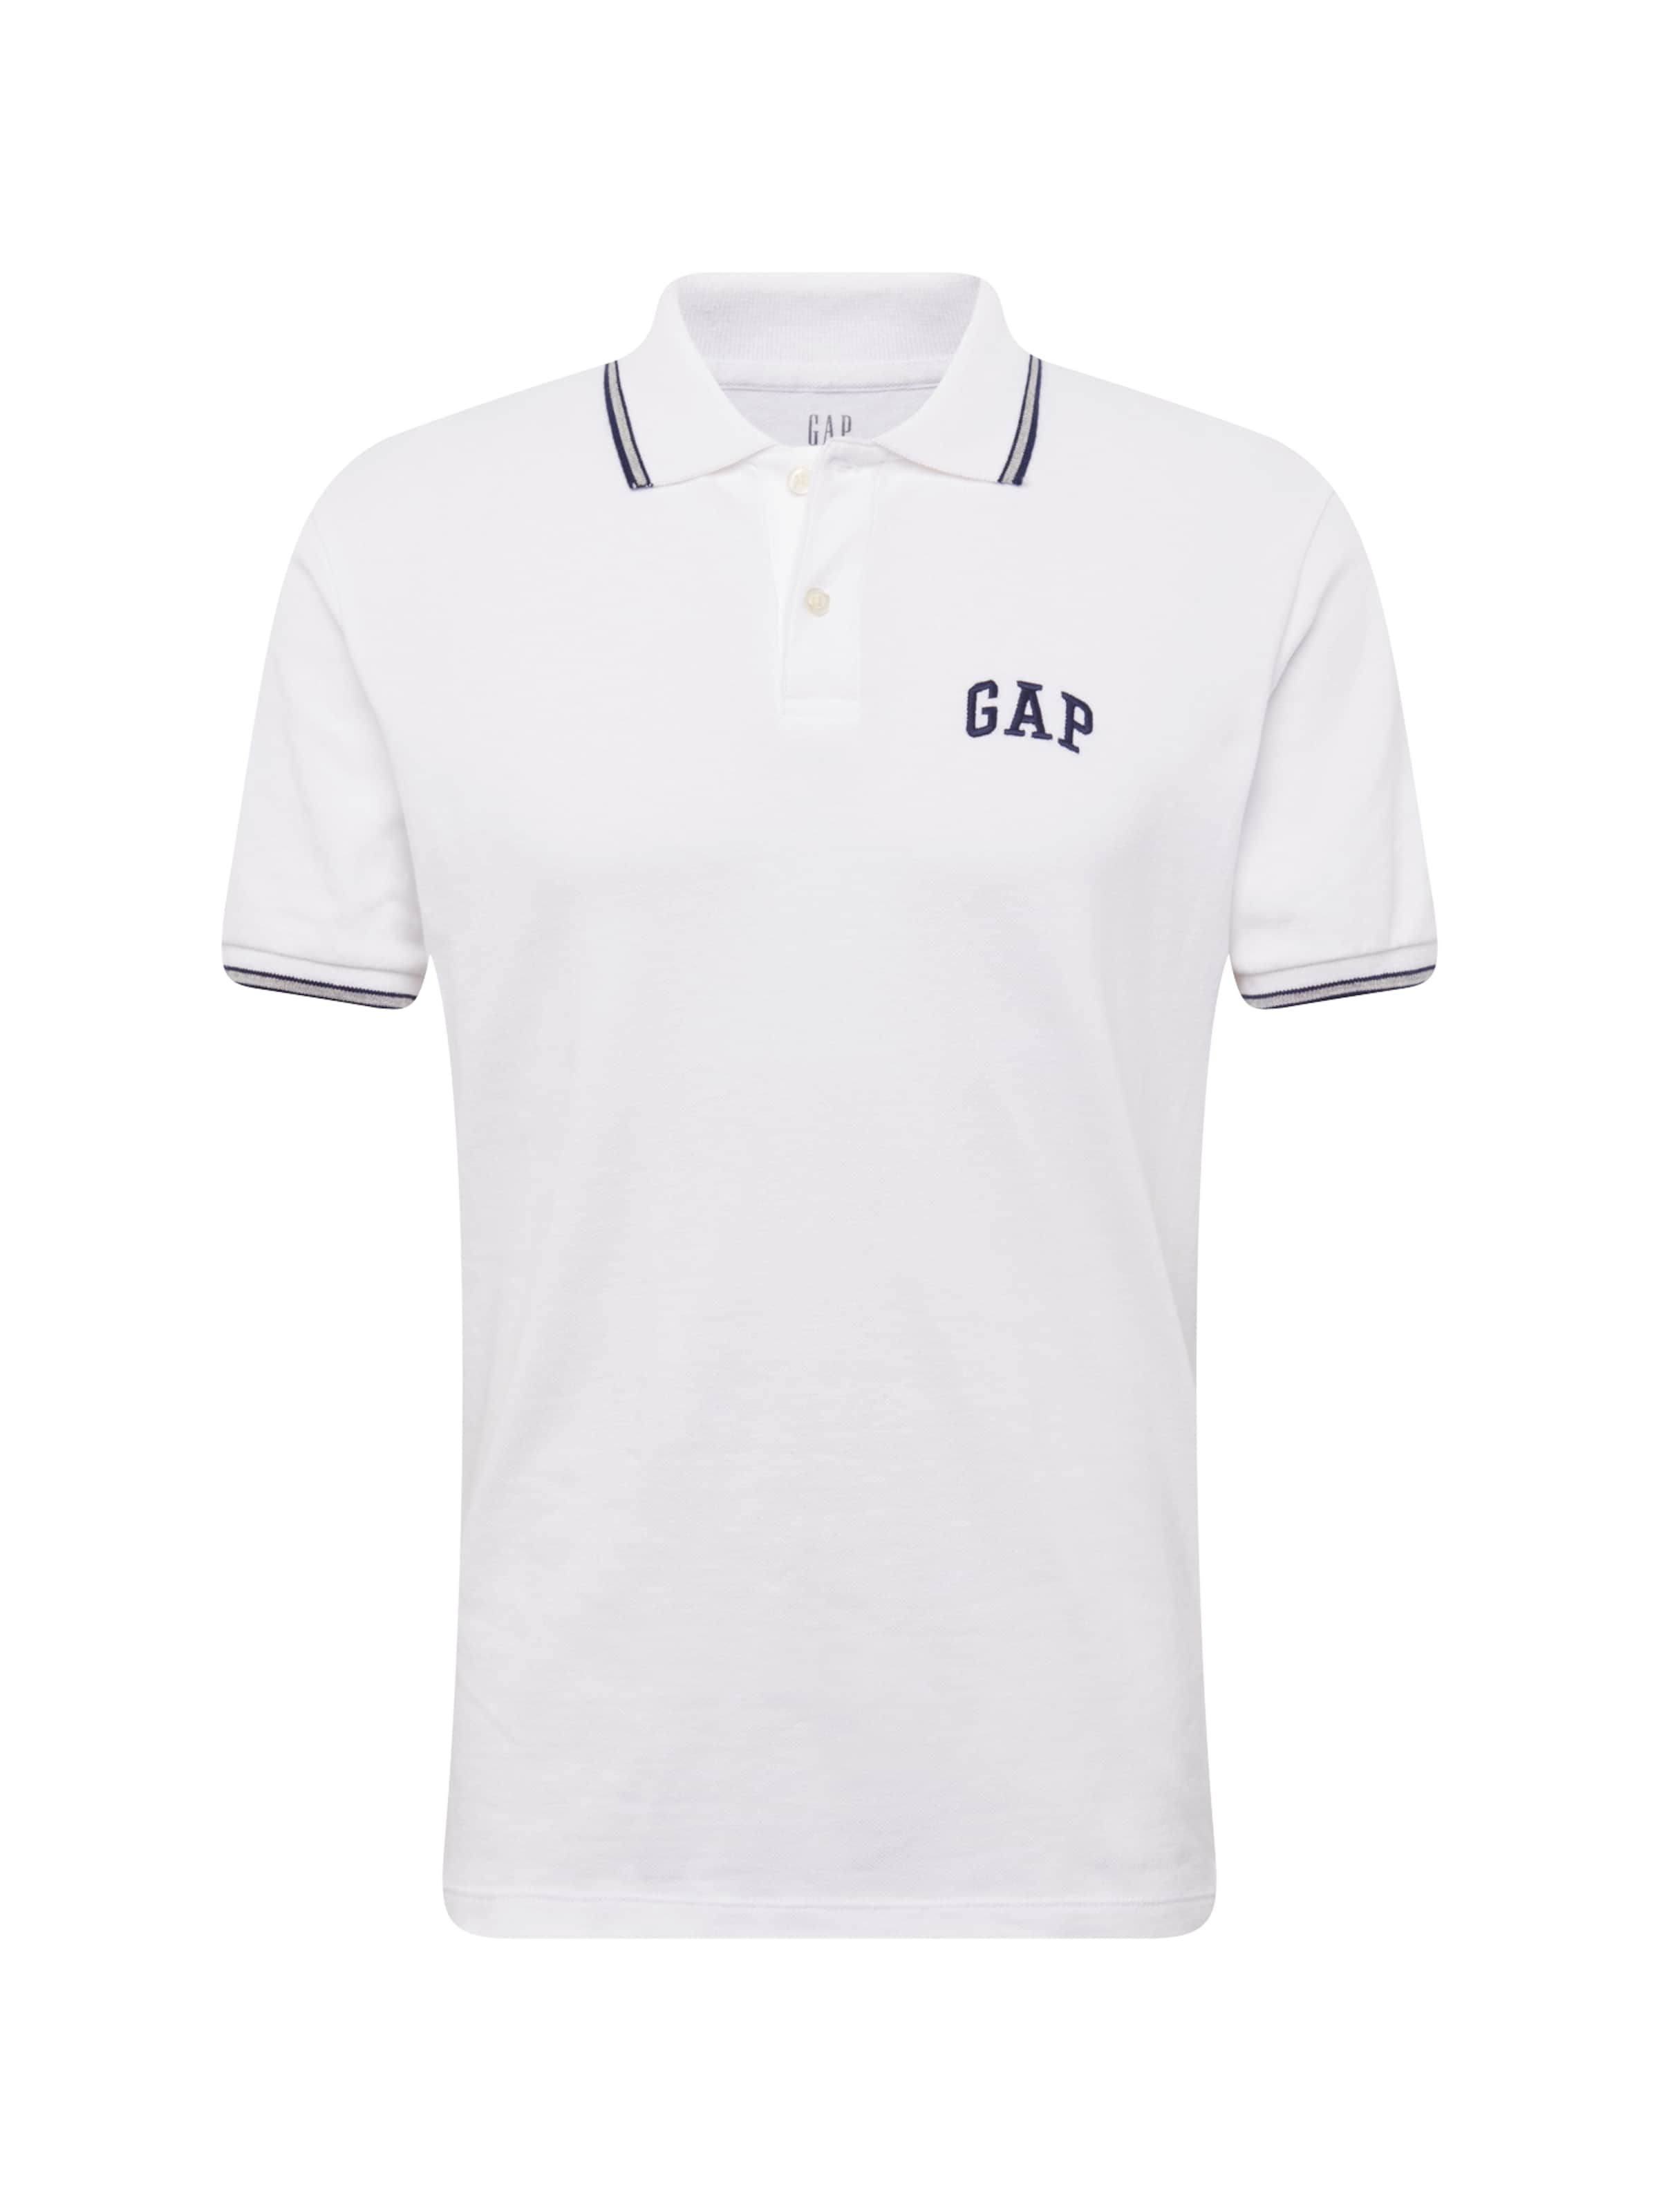 Blanc Pk Xls Polo' GapT shirt In 'franch vywON8nPm0